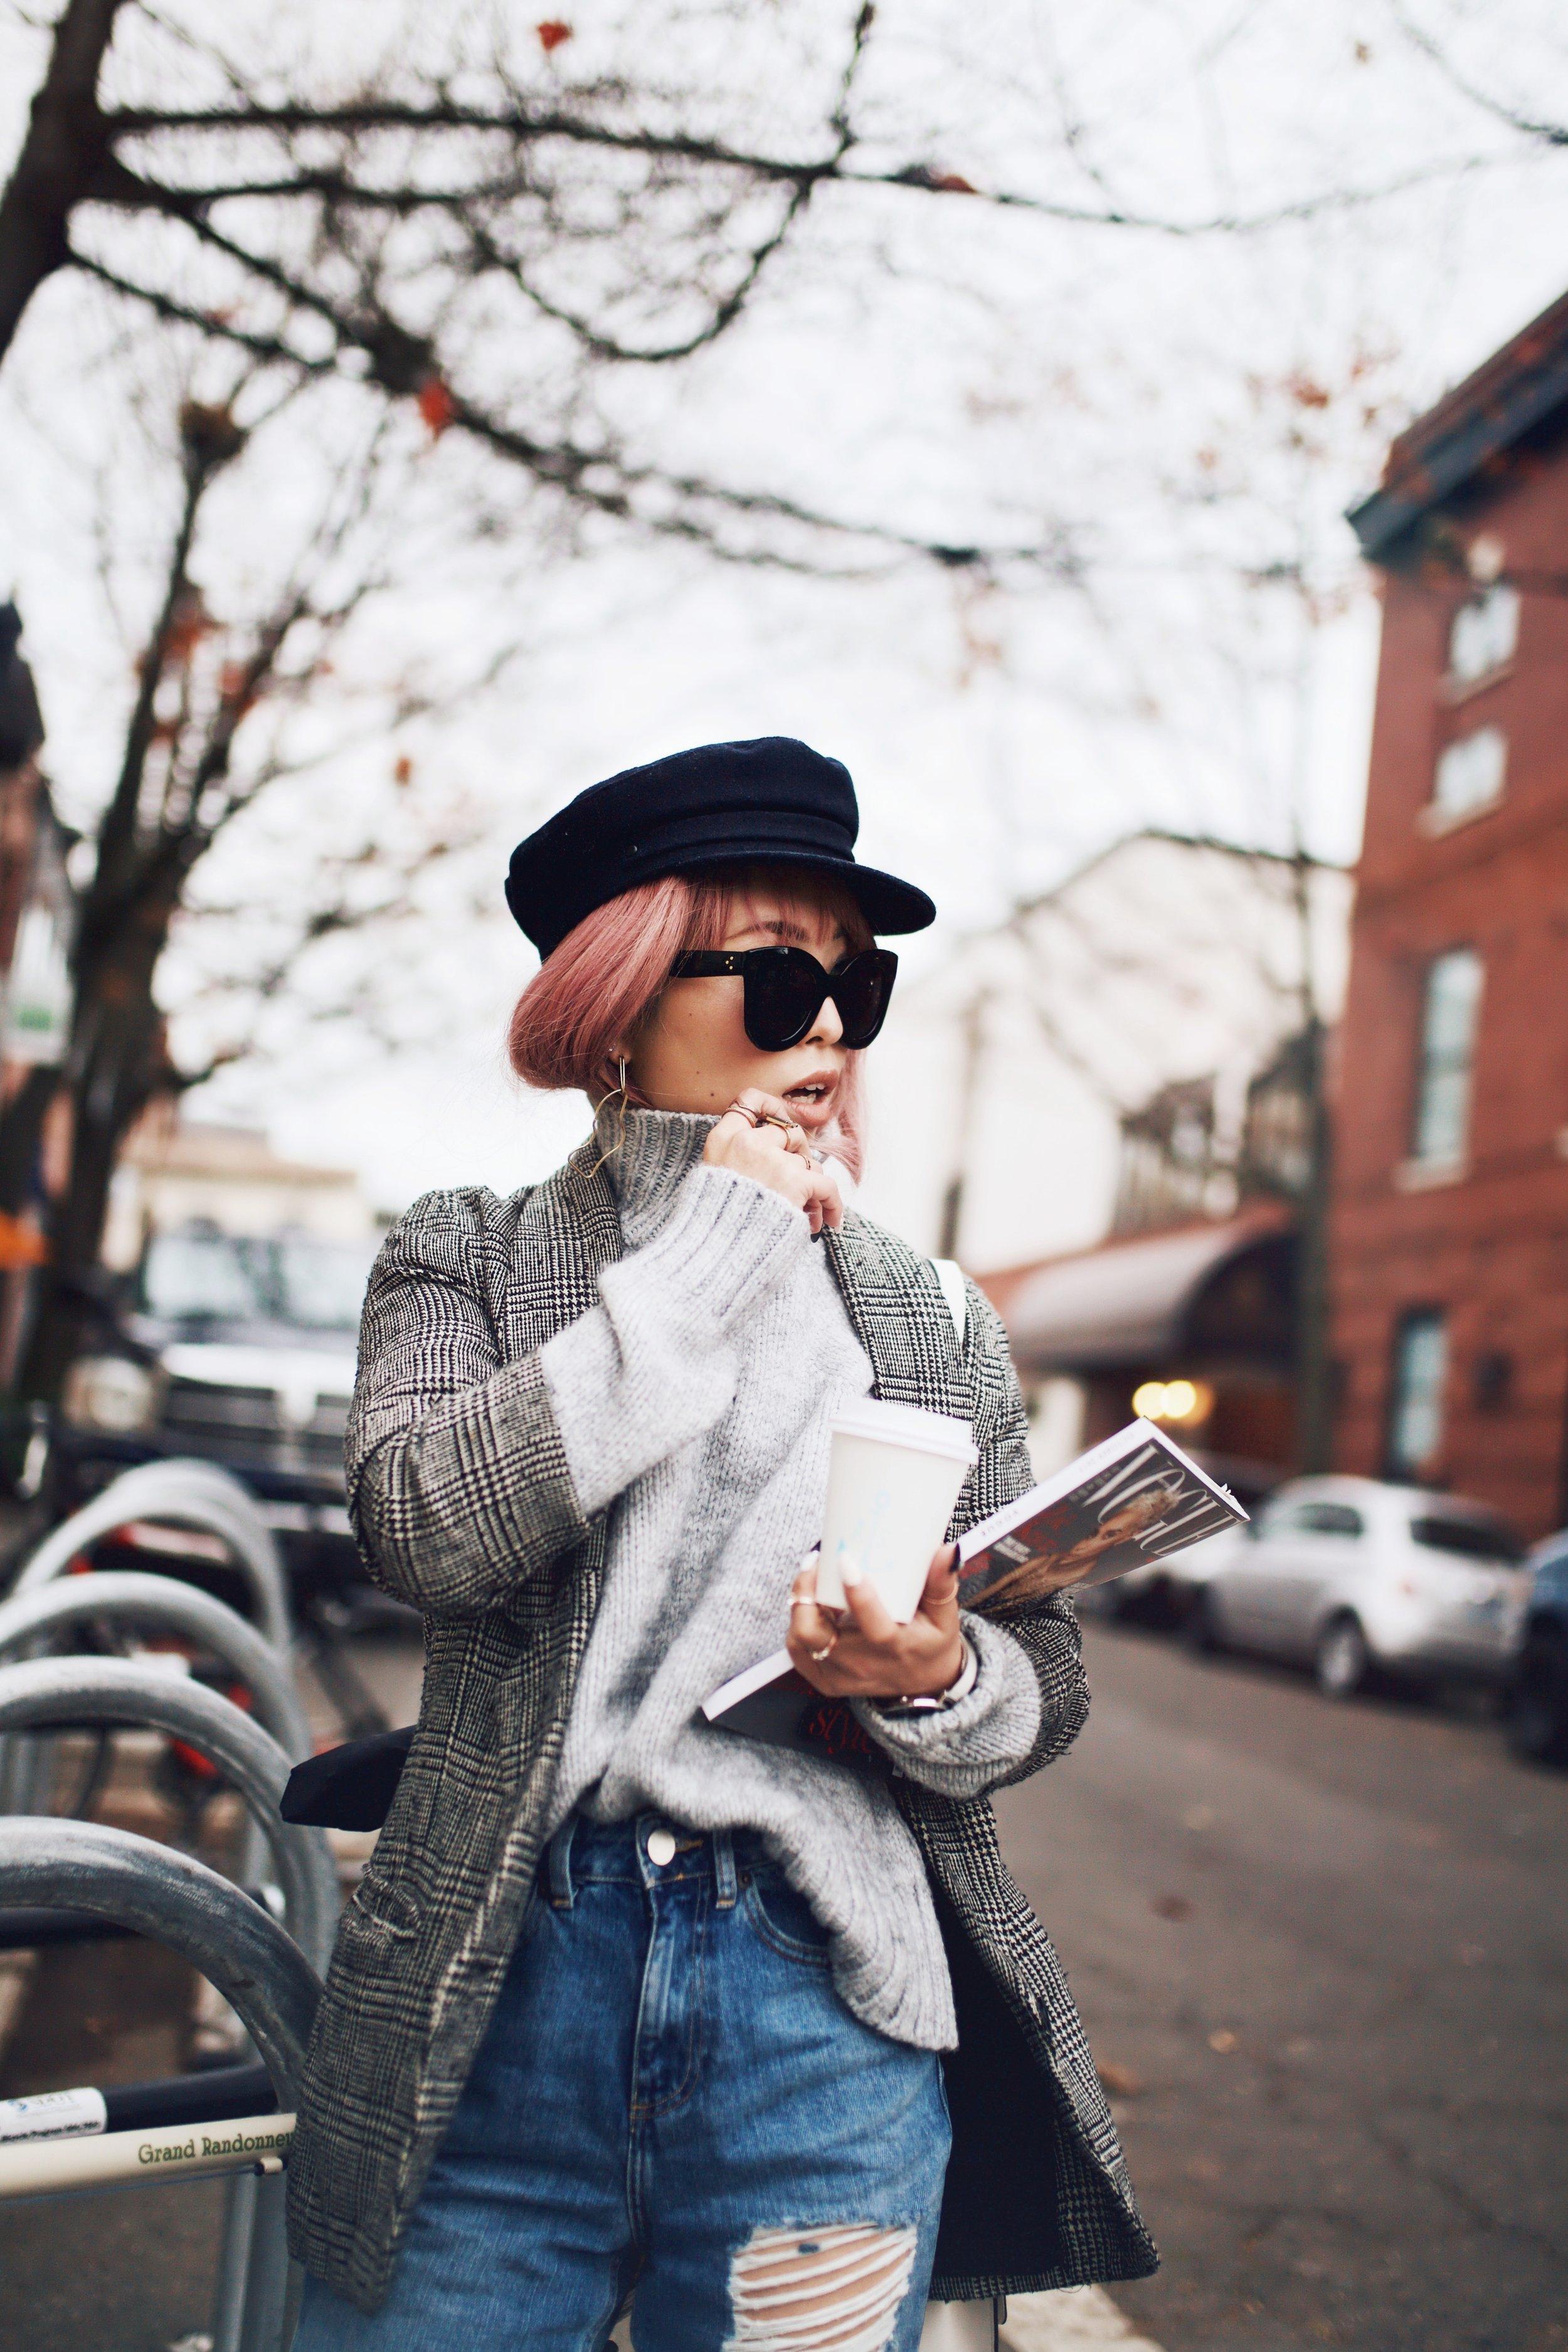 Kapten and Son watch-Zara Gray Turtleneck Sweater-Nordstrom Checked Blazer-ASOS Distressed frayed hem jeans-NAIGAI Glitter Ankle Socks-Black scrappy sandals-H&M White Crossbody Bag-Aritzia Fisherman Hat-Aika's Love Closet-Seattle fashion style blogger-pink hair-Japanese 11